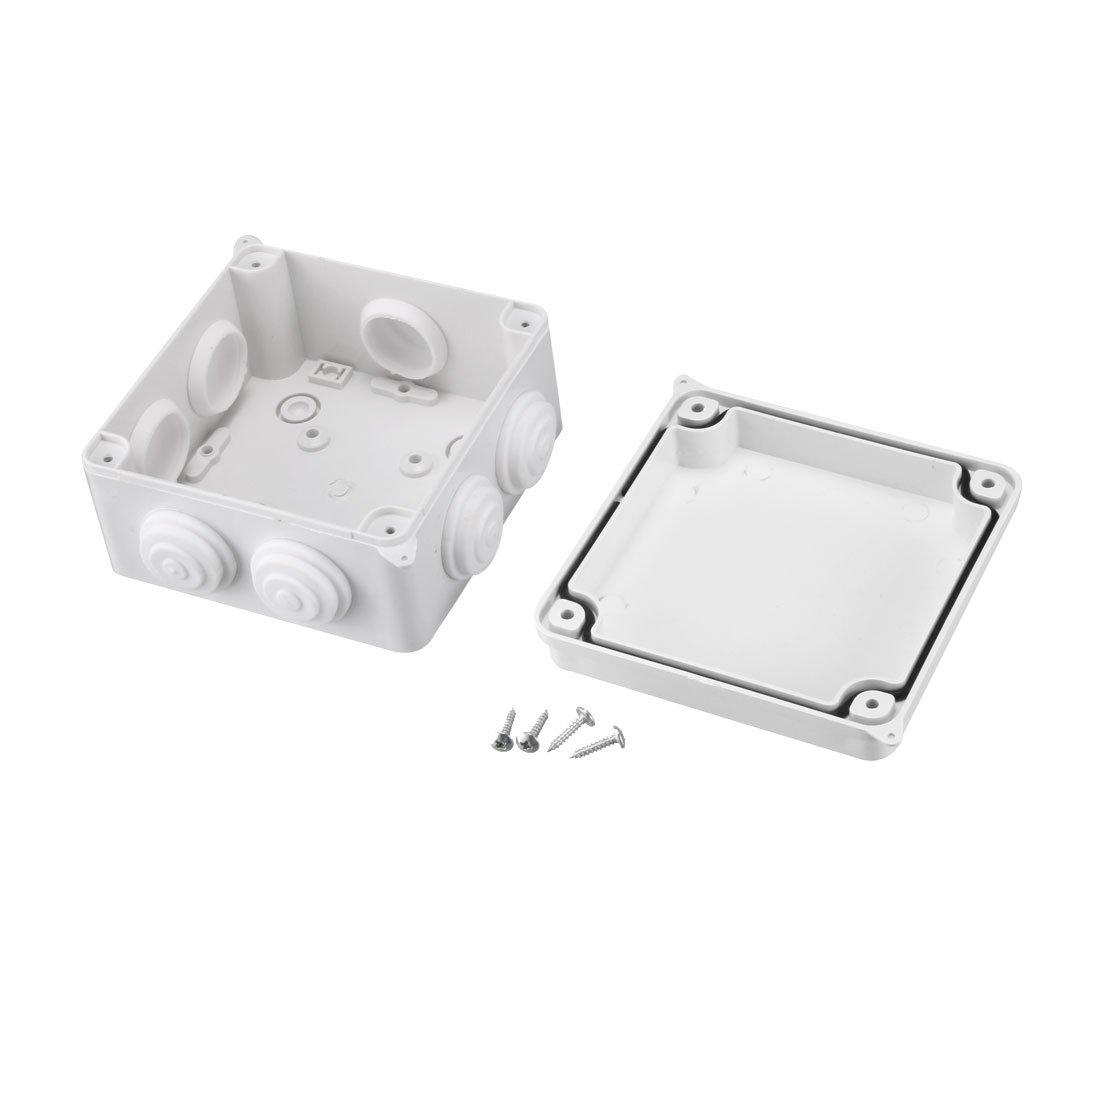 sourcingmap 109 x 109 x 66mm Electronic Plastic DIY Junction Box Enclosure Case White